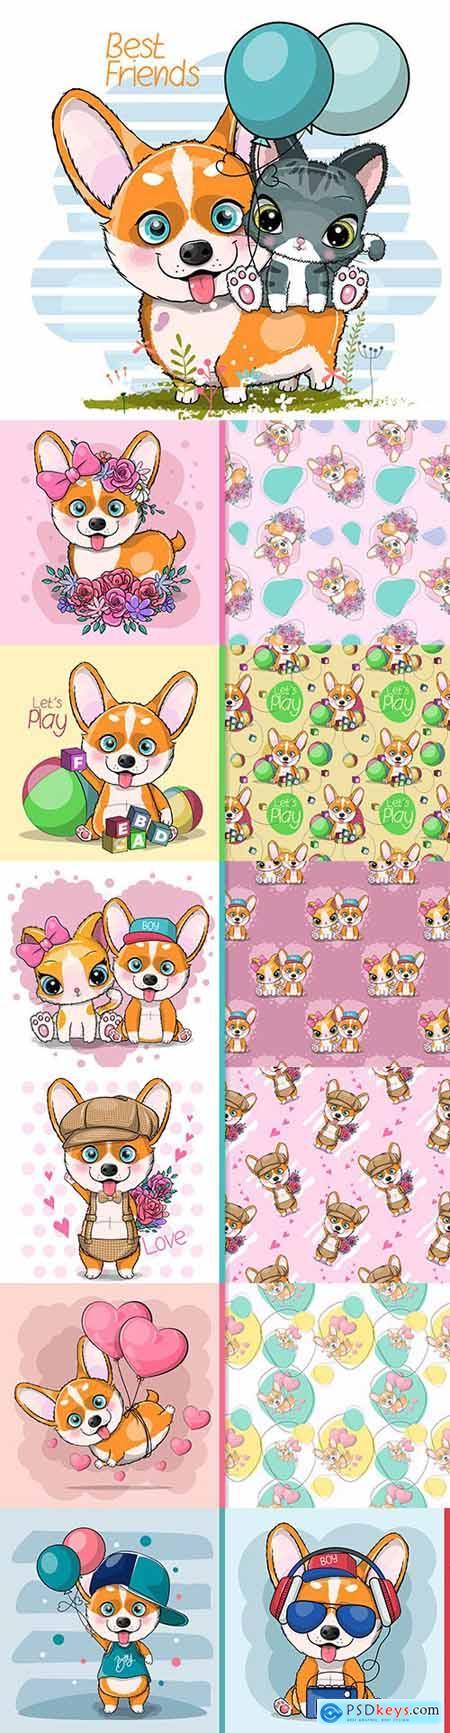 Cute dog feed cartoon and seamless background